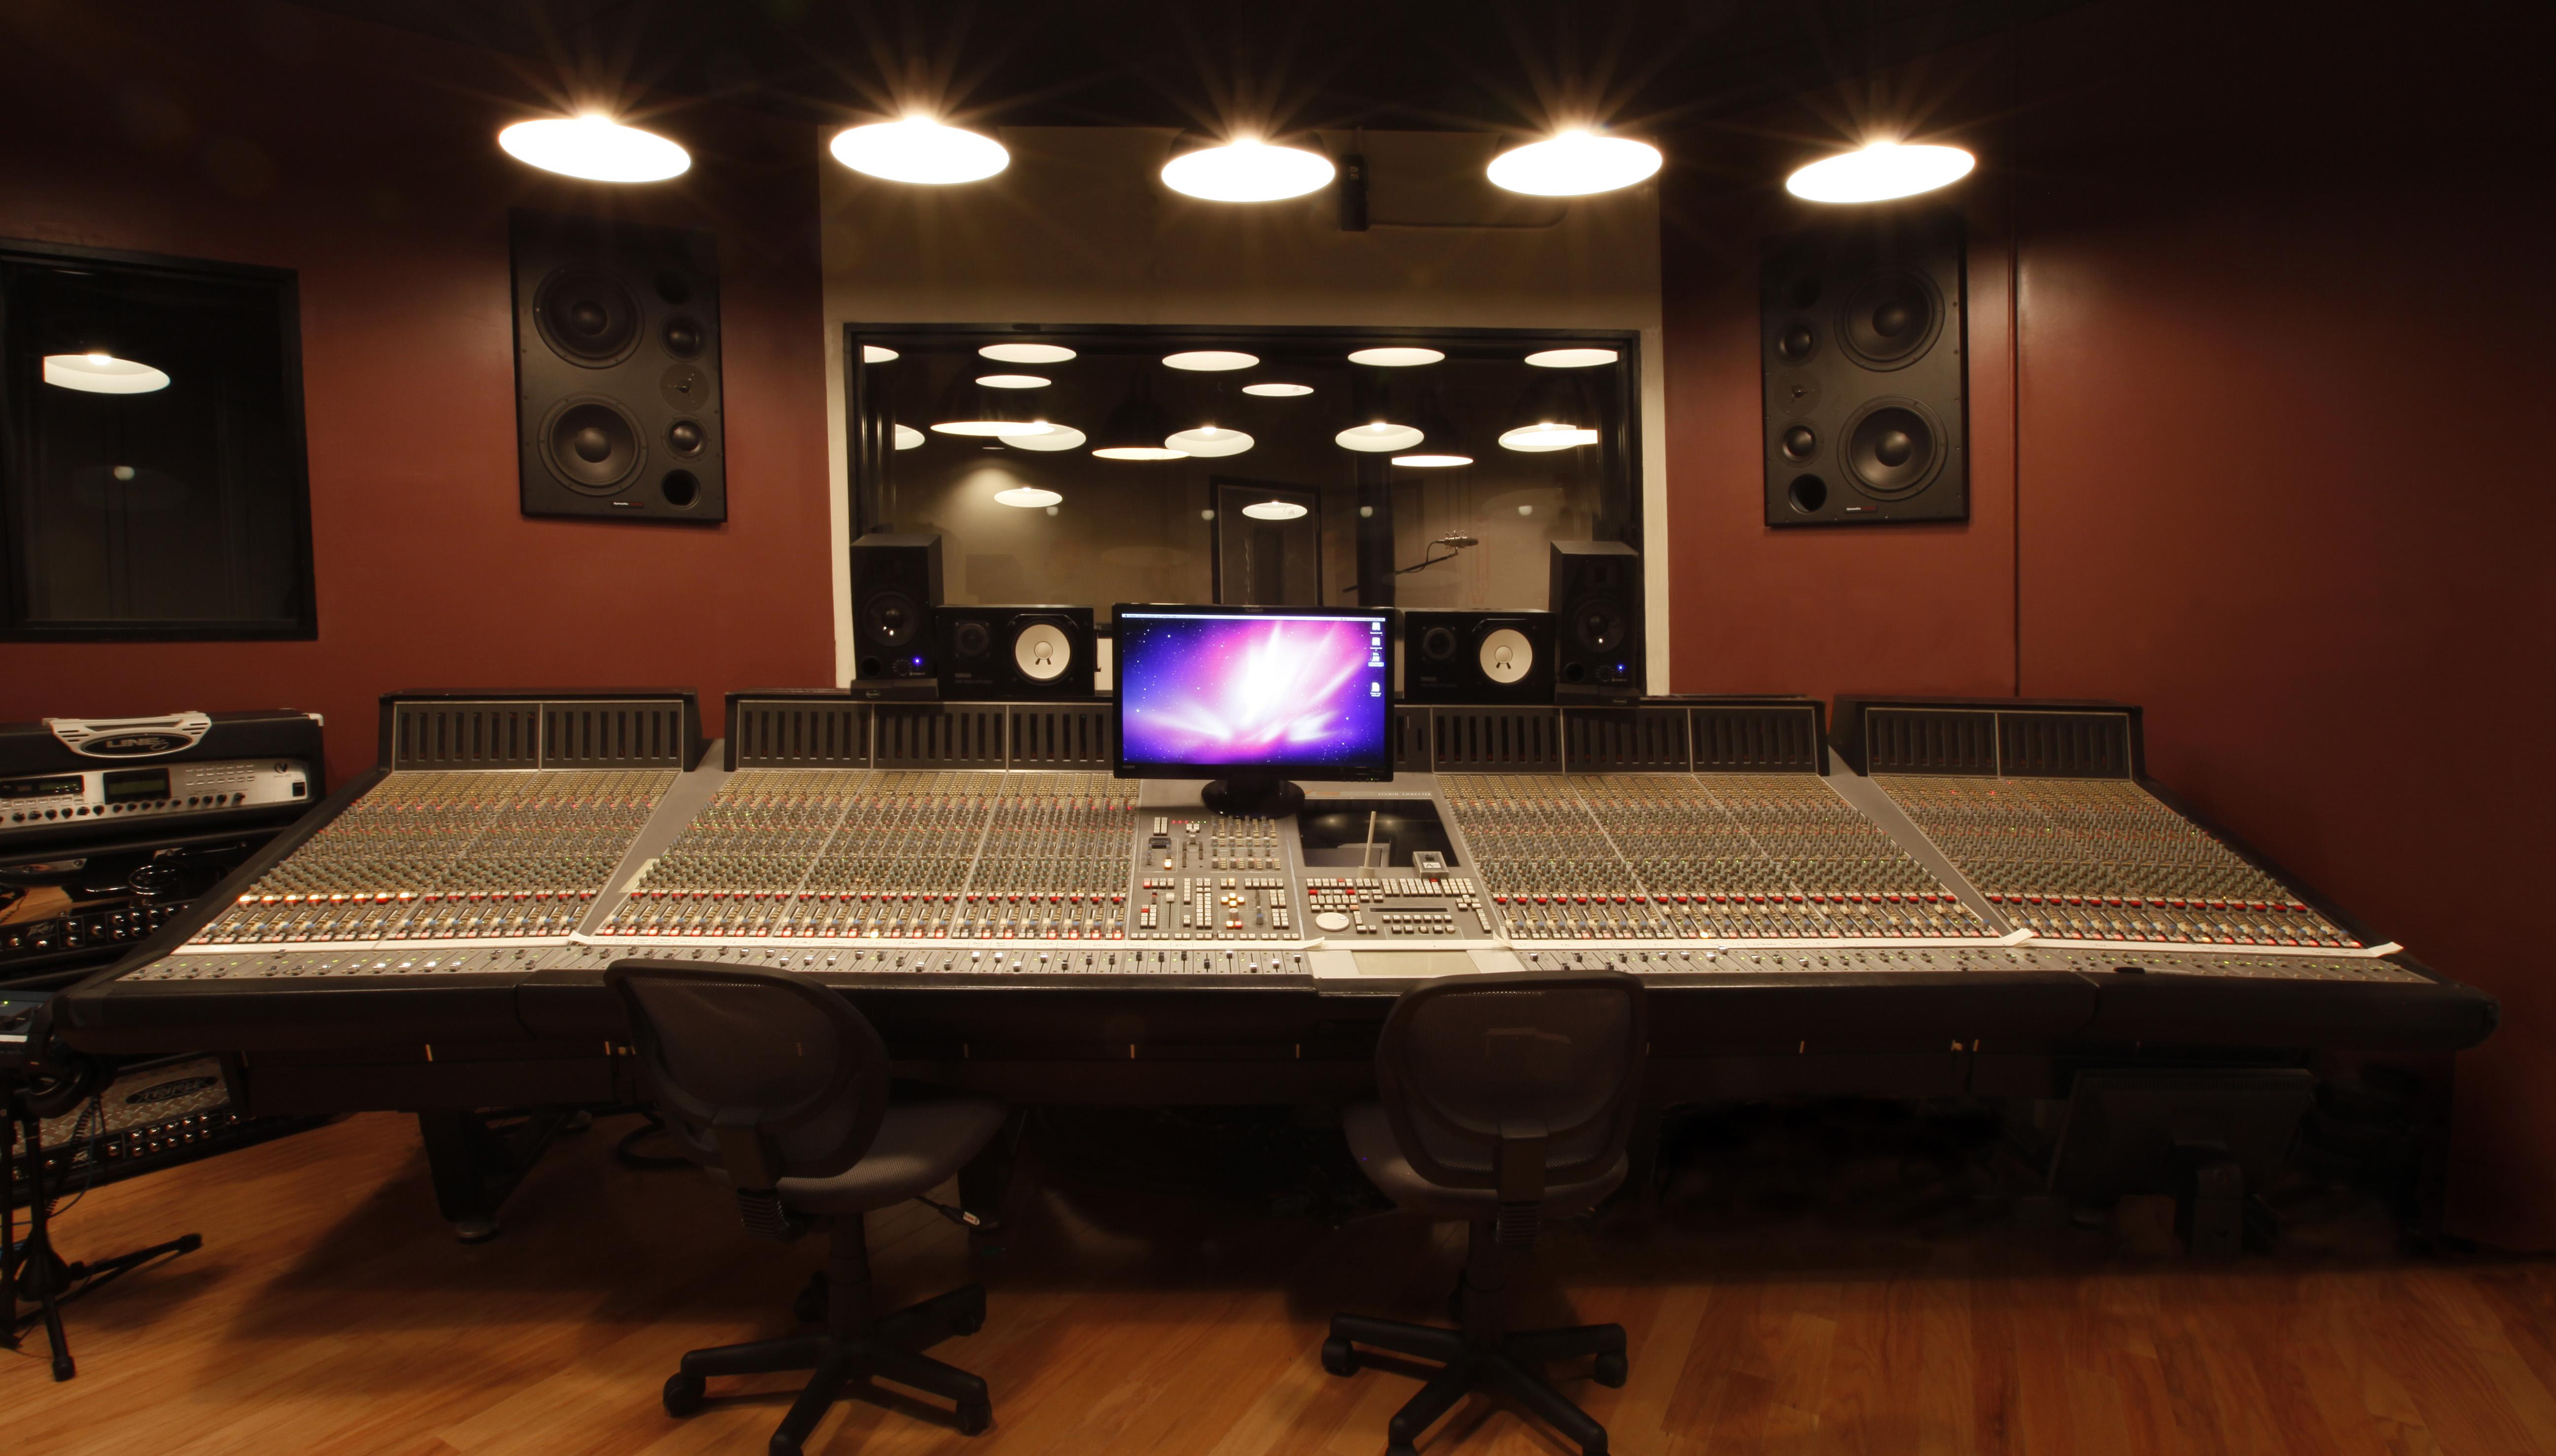 Pin Music Recording Studio Hd Desktop Wallpaper High Definition on 5188x2956